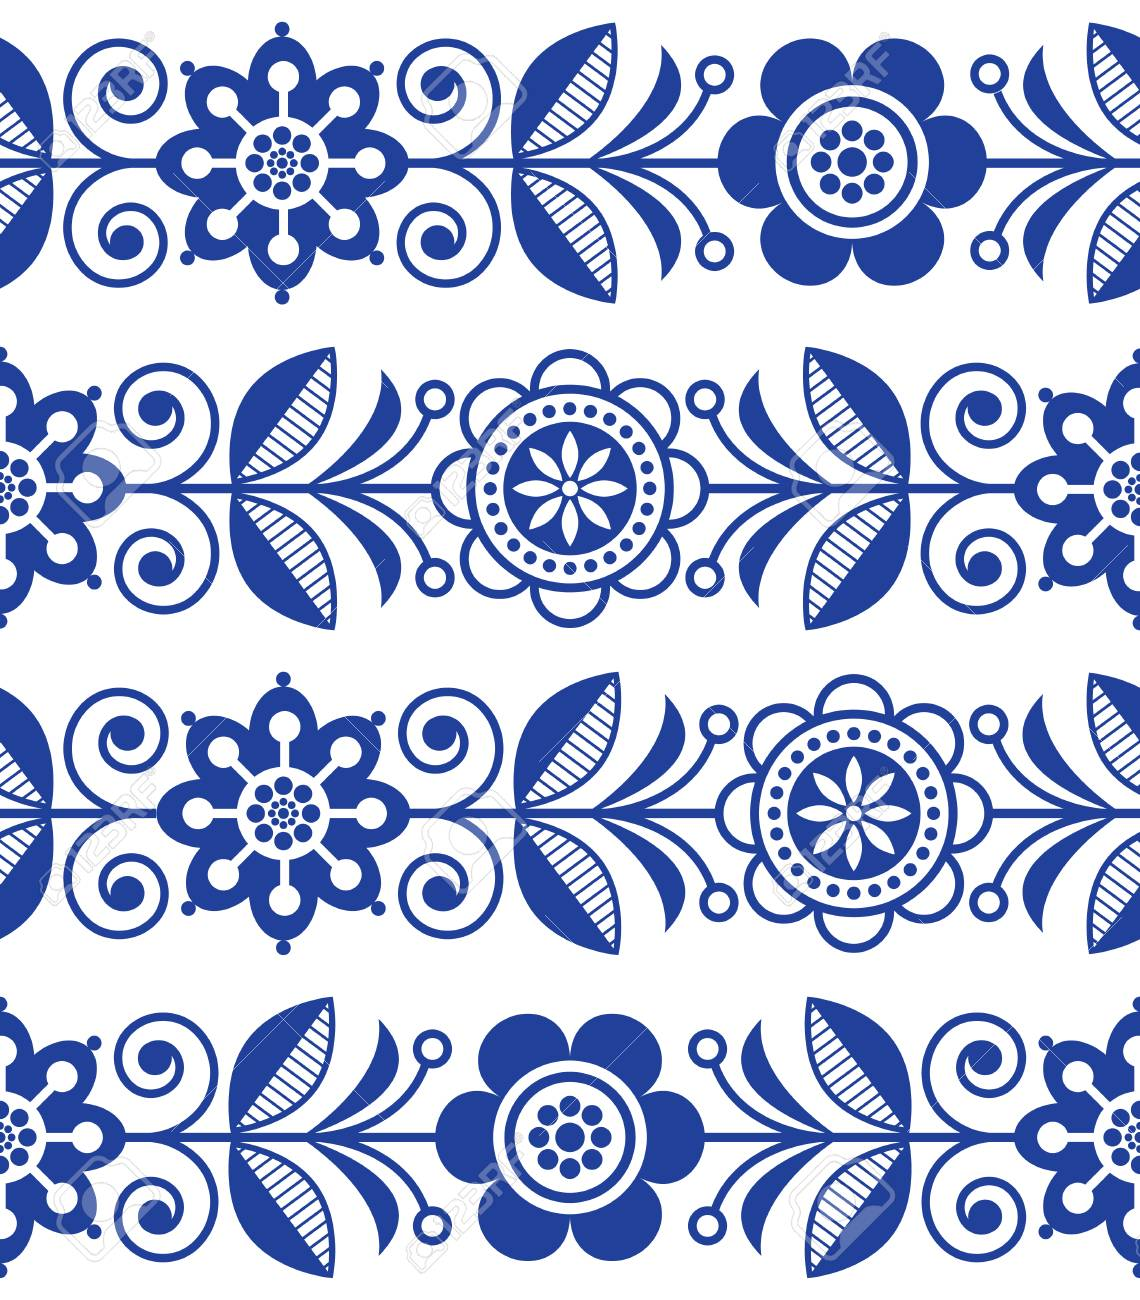 Folk Art Seamless Pattern Vector Floral Repetitive Design